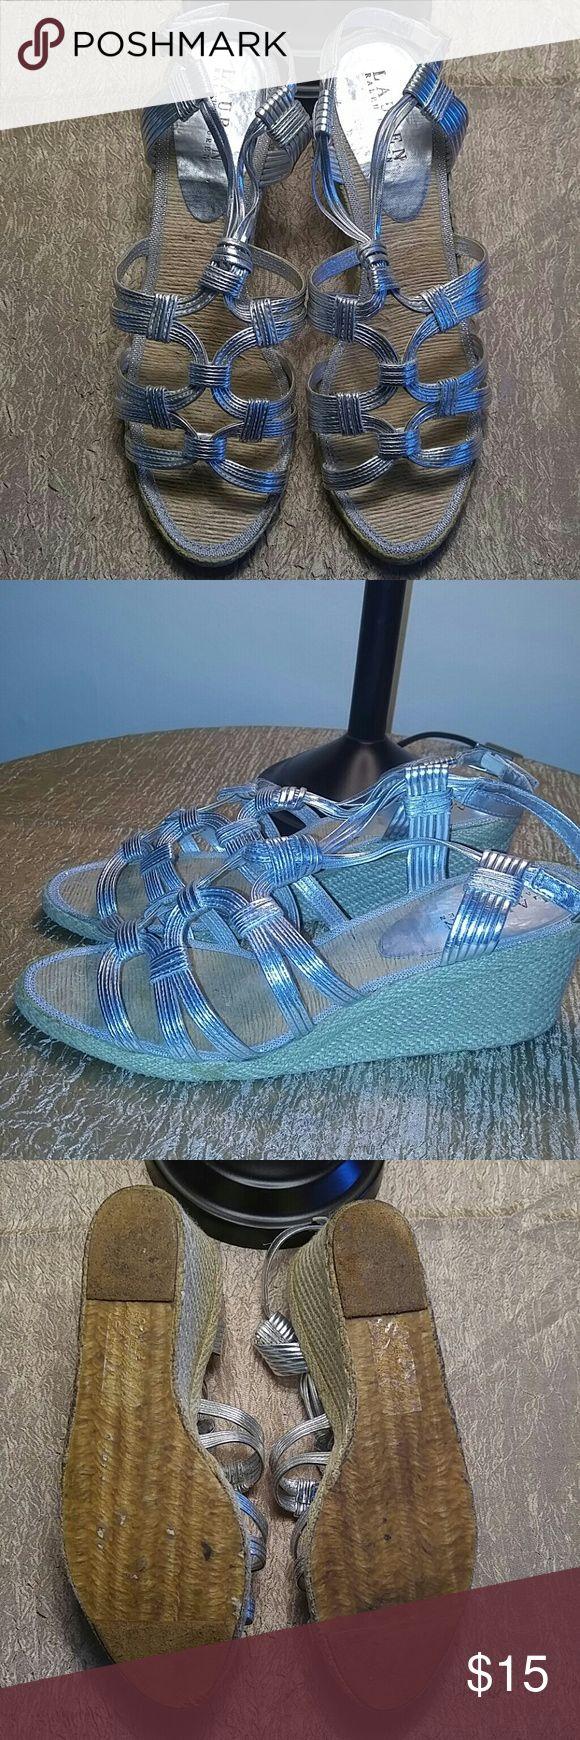 Ralph Lauren Metallic Silver Espadrille Ralph Lauren Metallic Silver Espadrilles. Size 9.5 Ralph Lauren Shoes Espadrilles